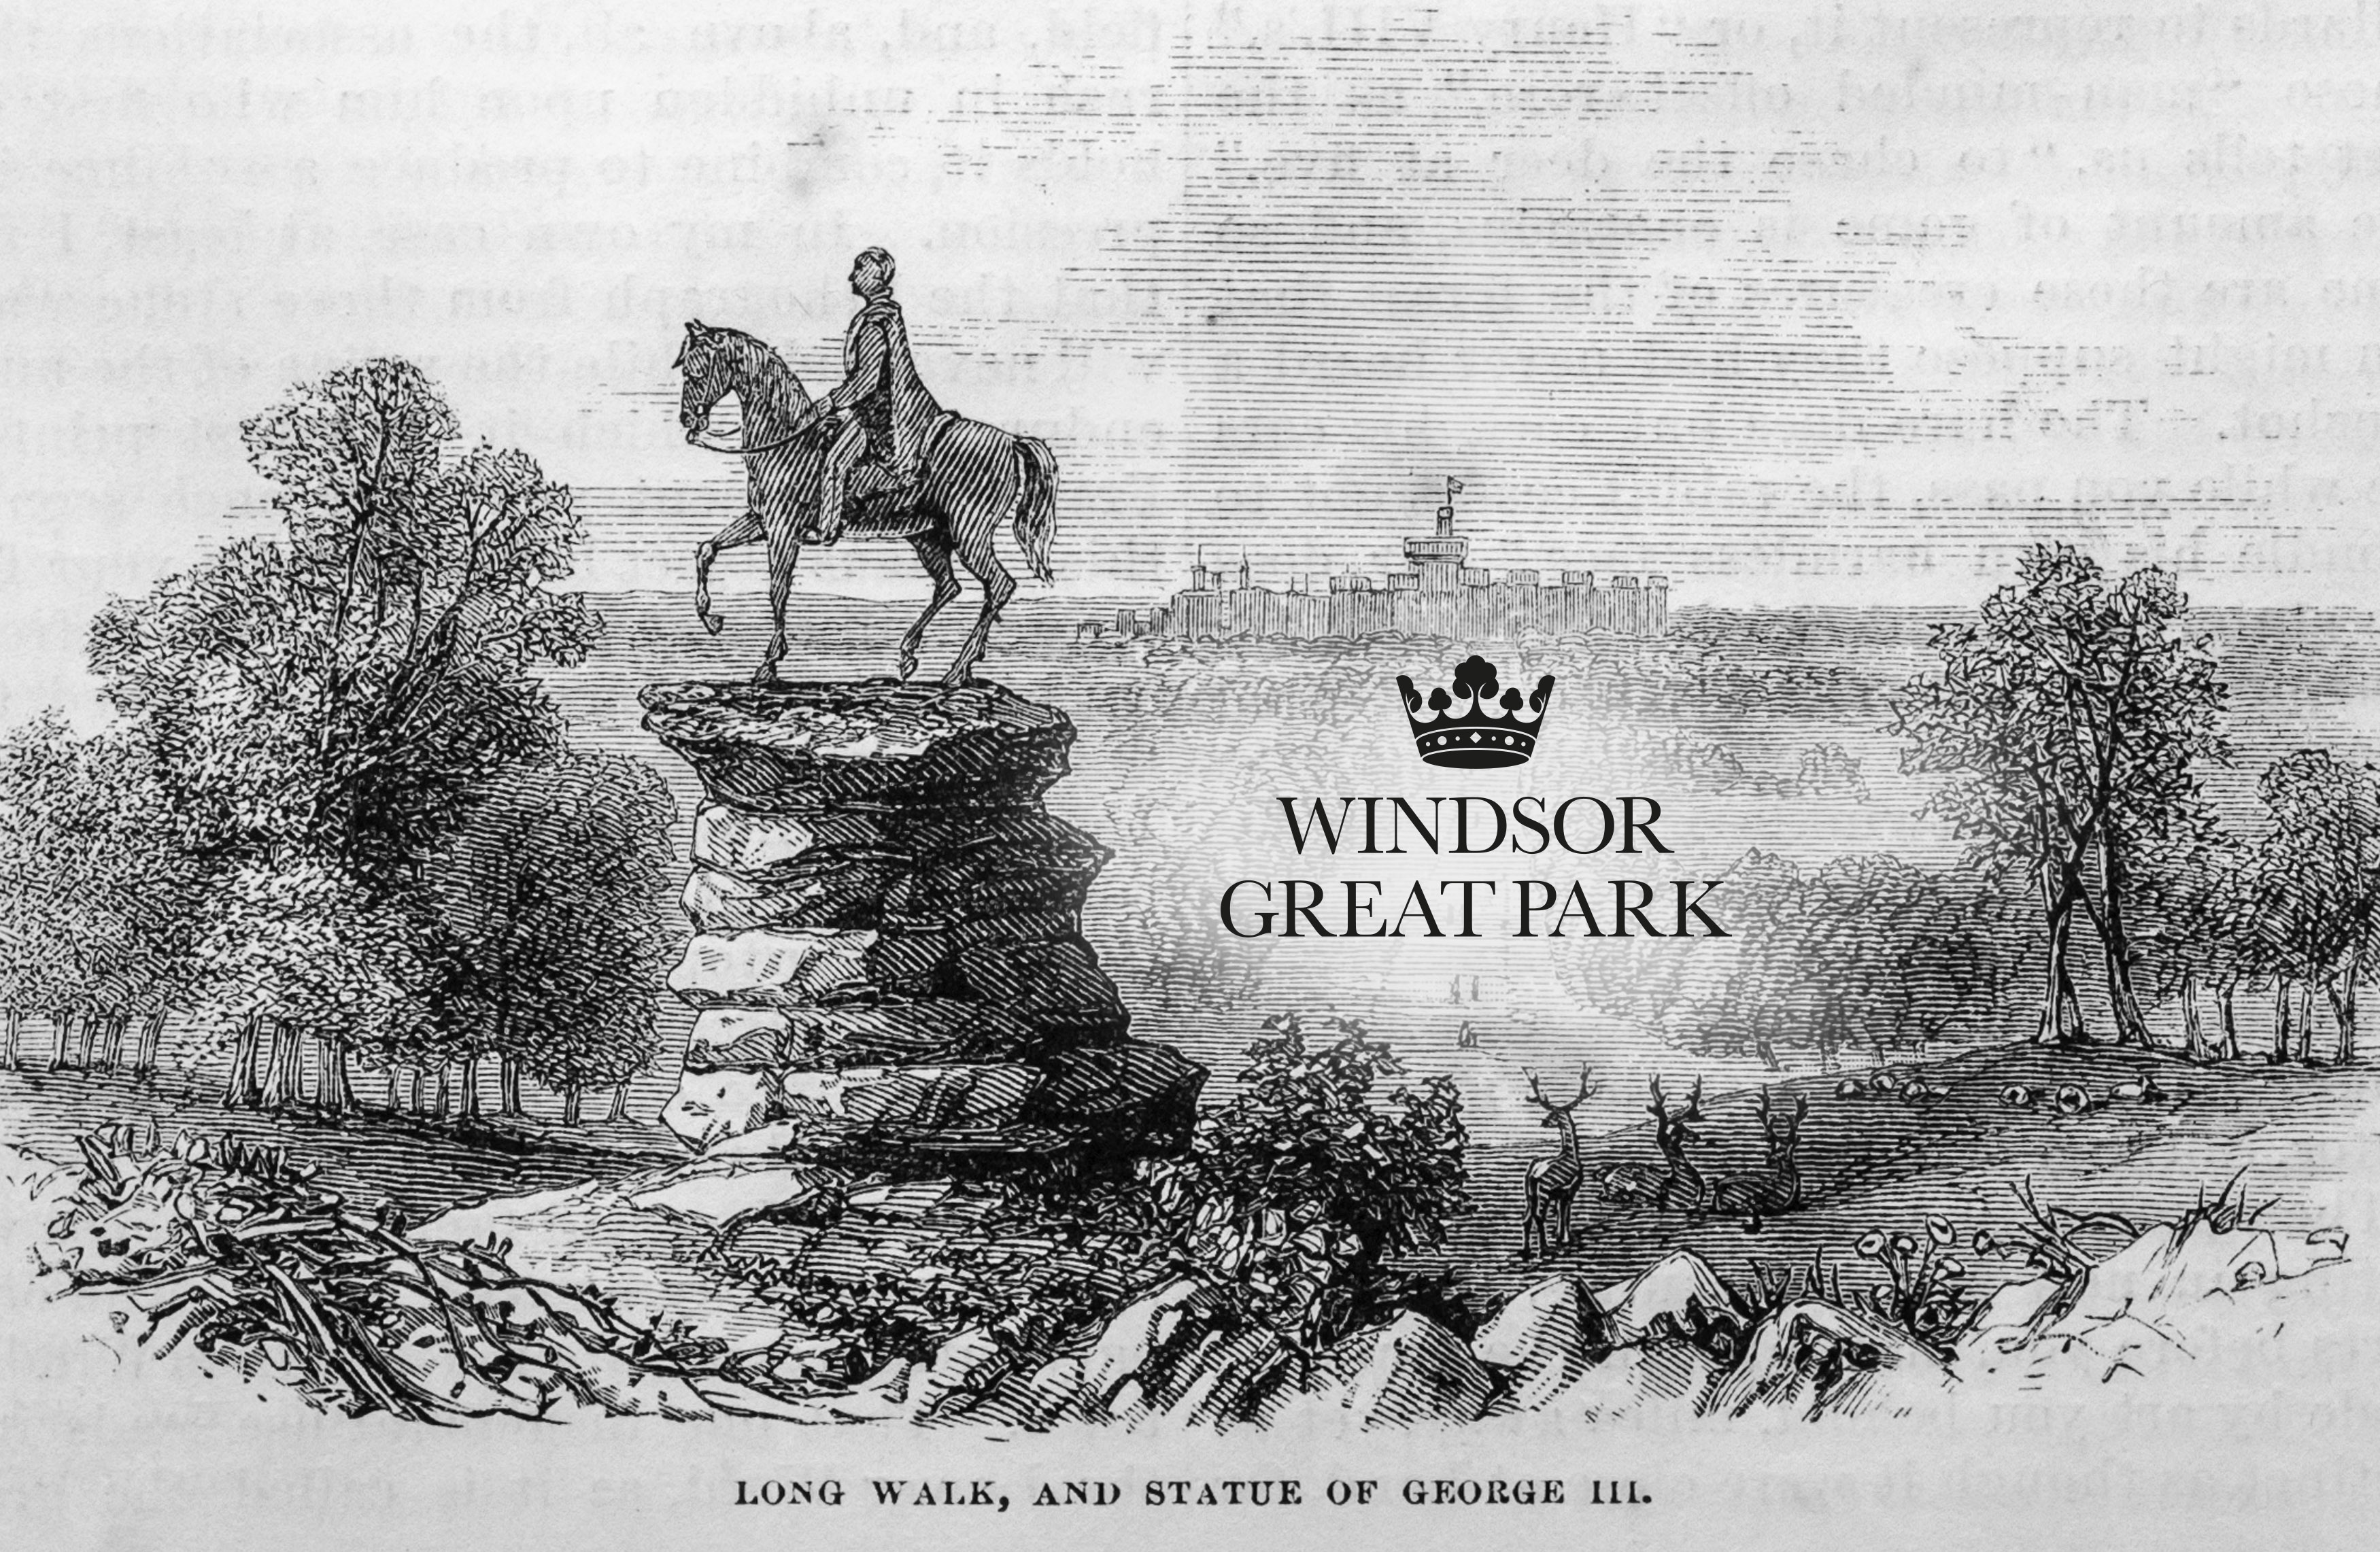 Windsor Great Park website design and development